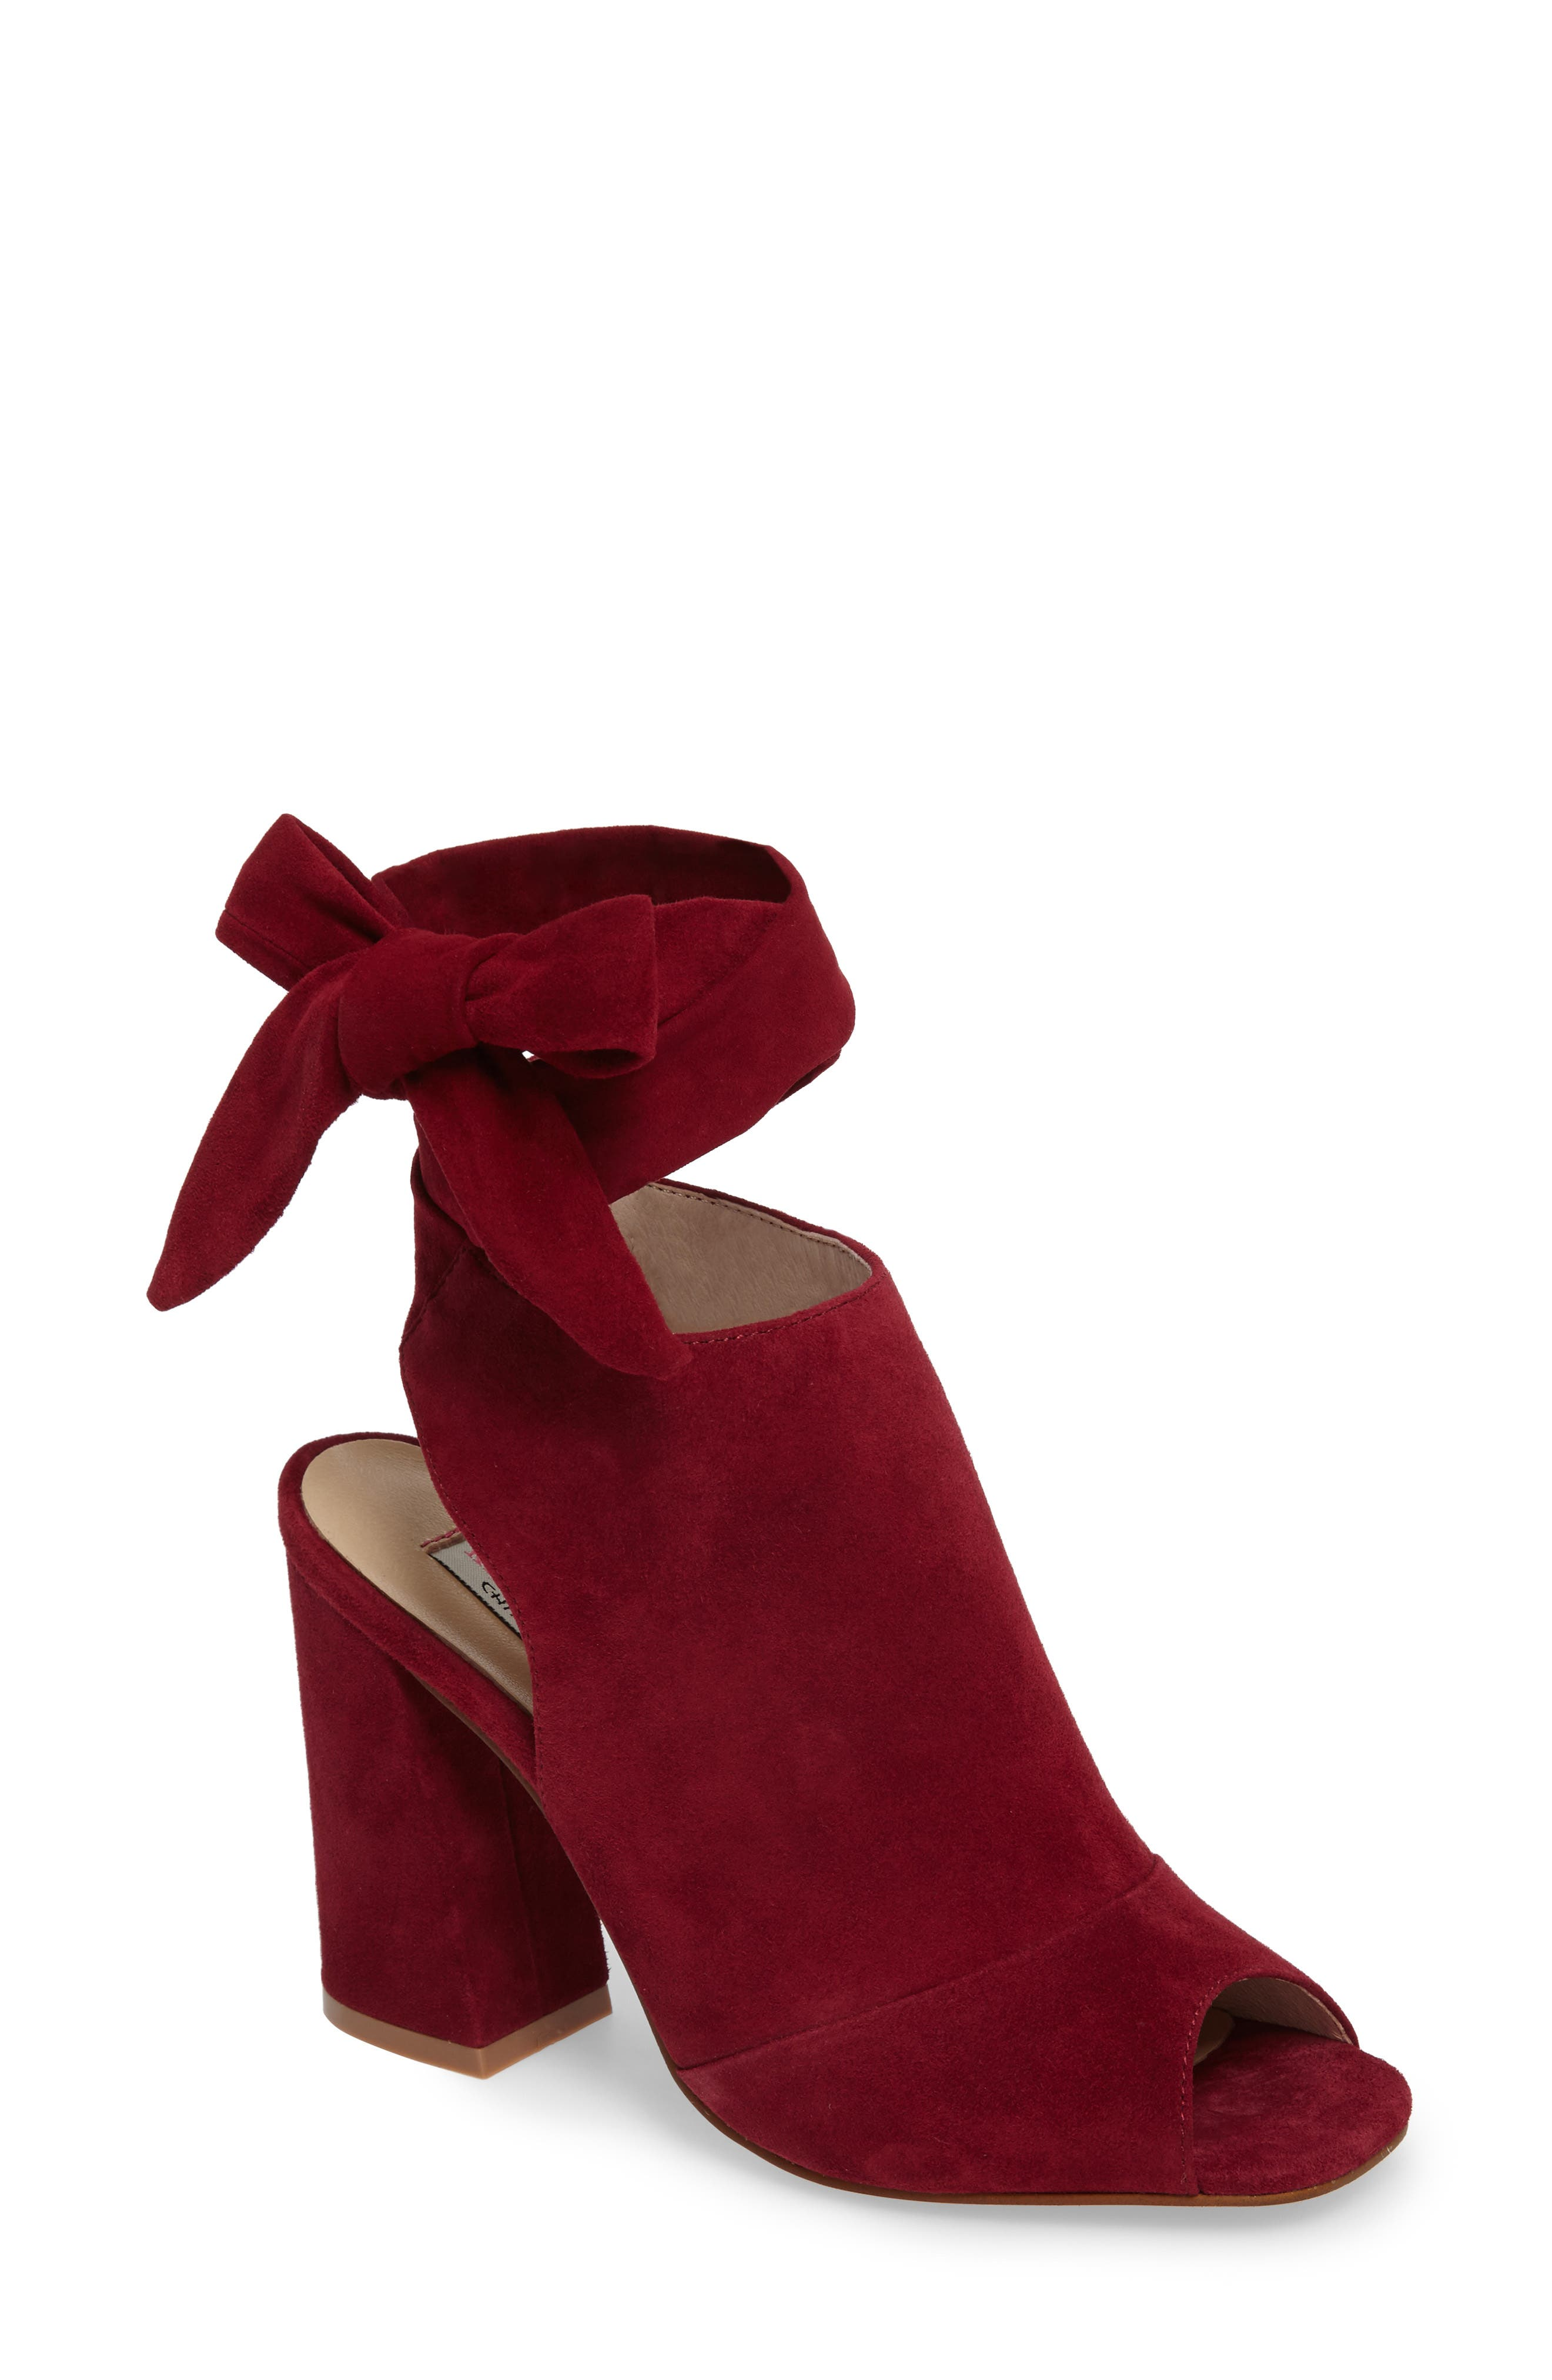 4b2b4f7eb0f6 Women s Black Trend Shoes